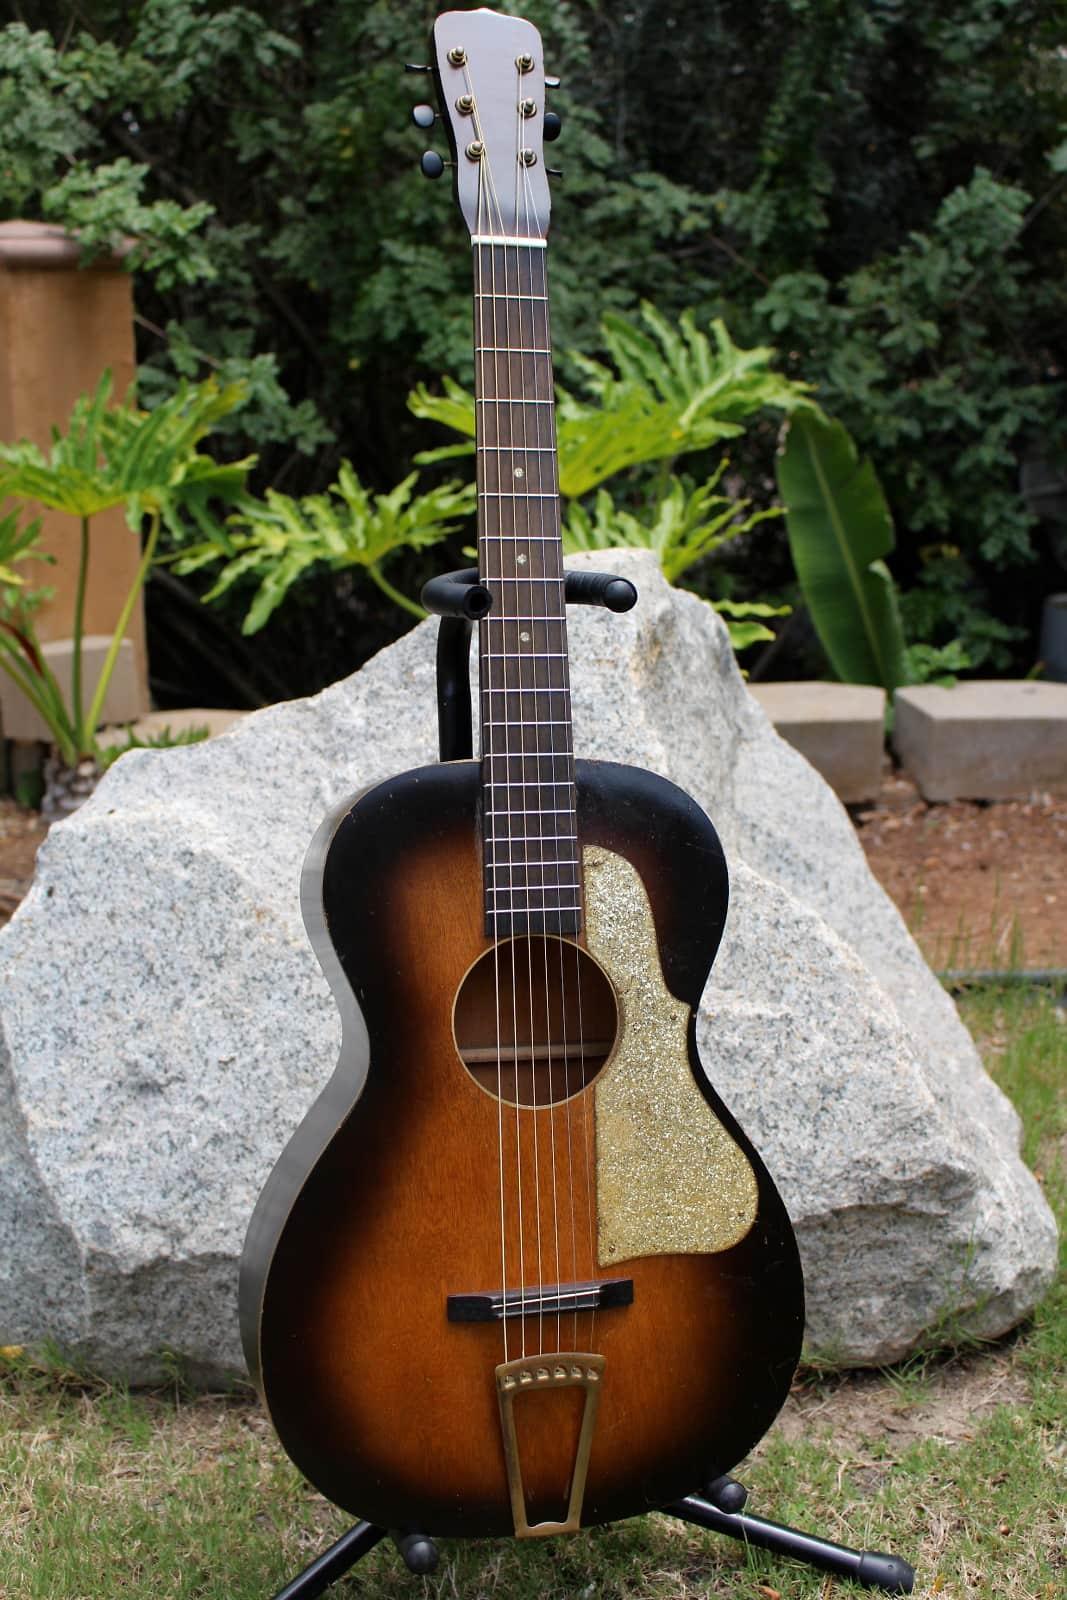 Vintage Regal Acoustic Parlor Guitar 1930s USA Restored